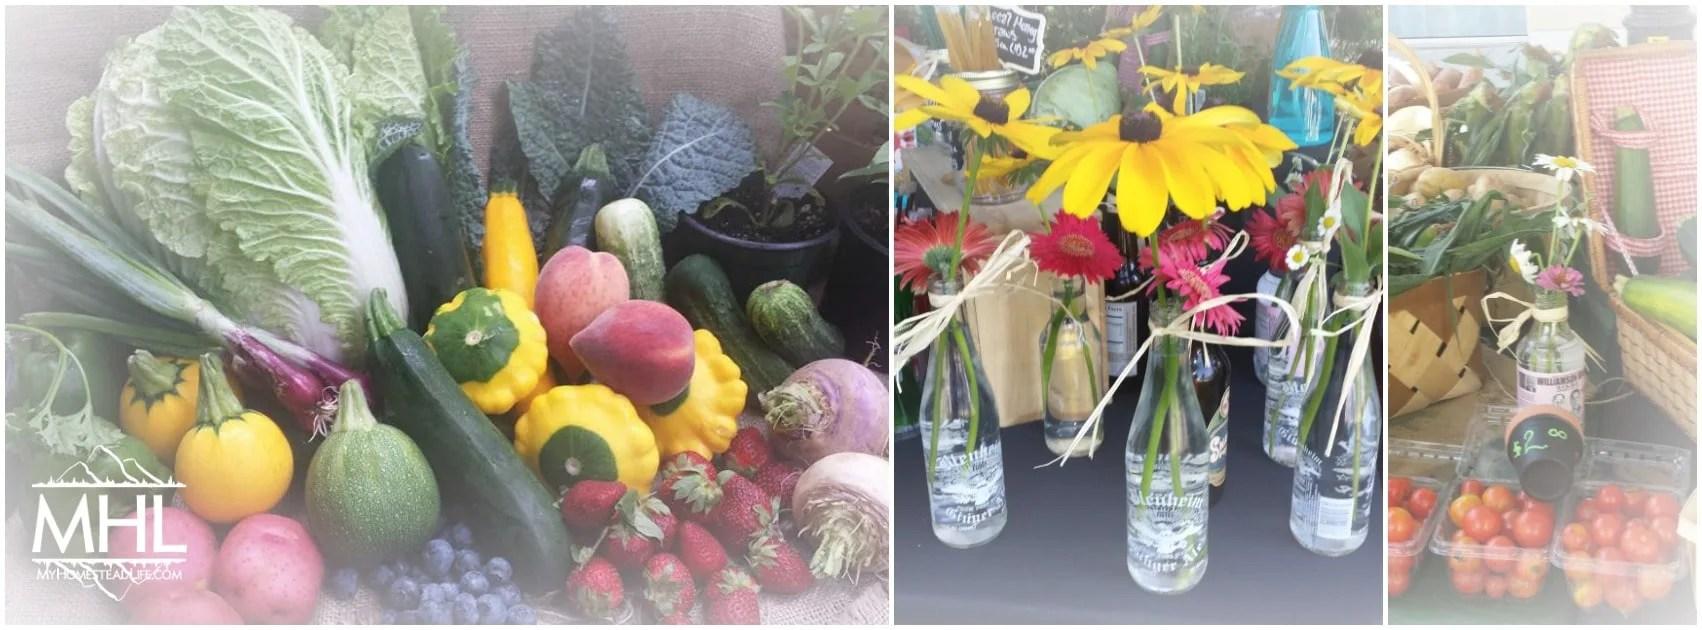 gardening at www.myhomesteadlife.com